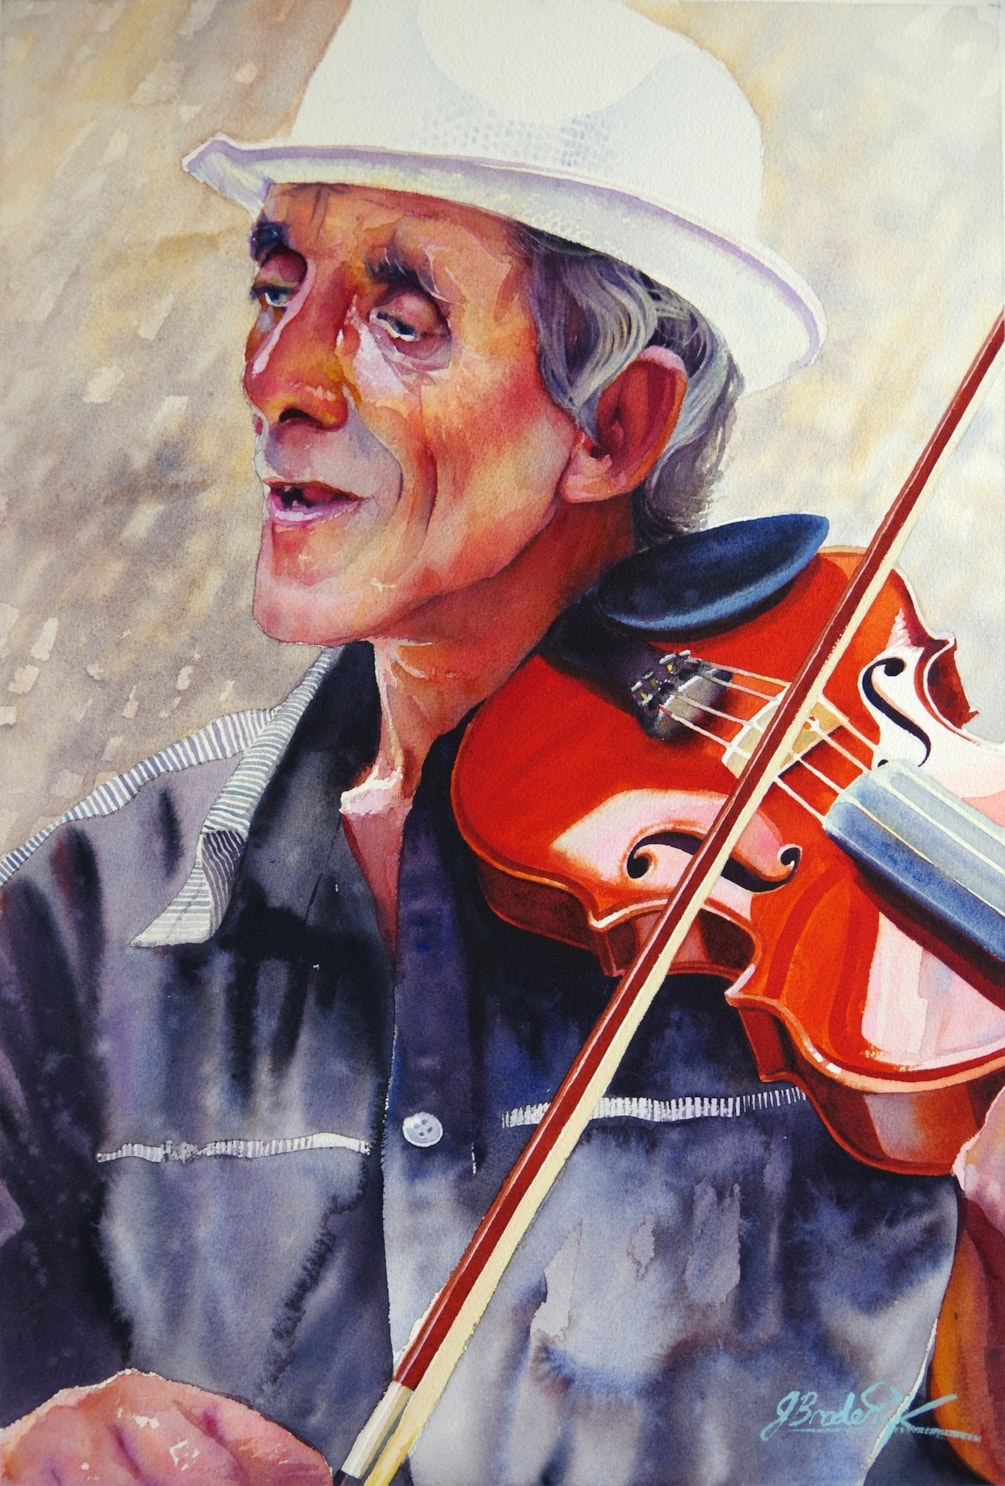 The Venice Violinist